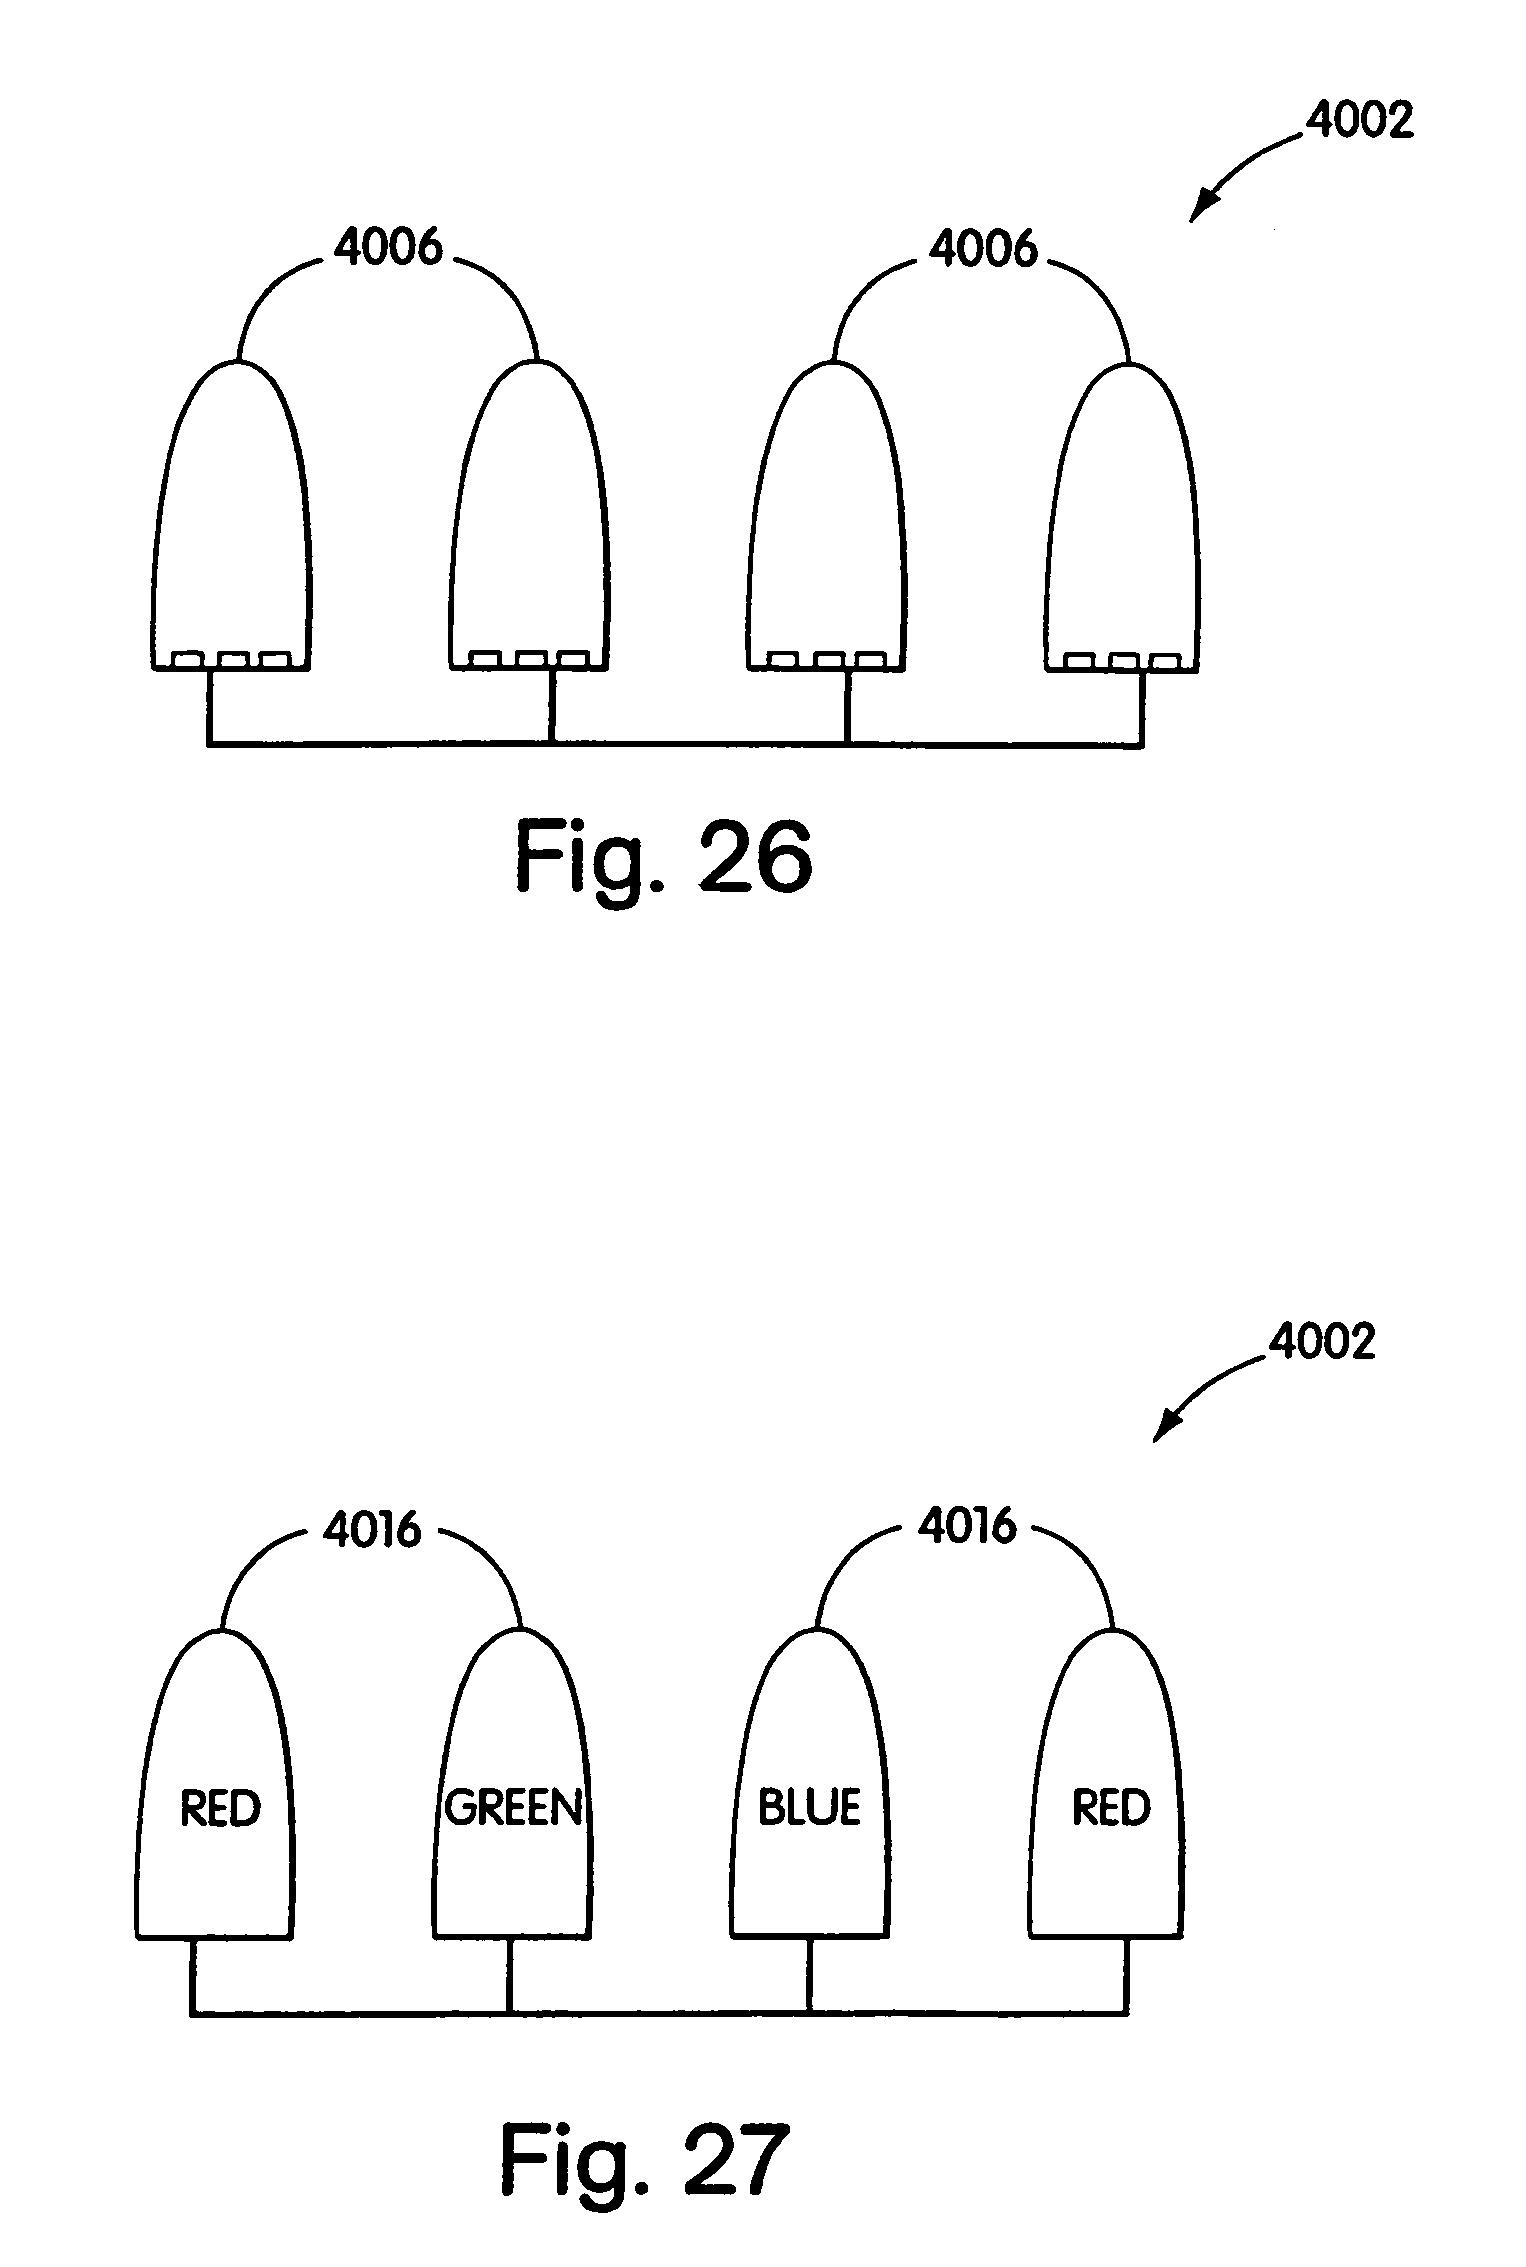 Patent US 7,352,339 B2